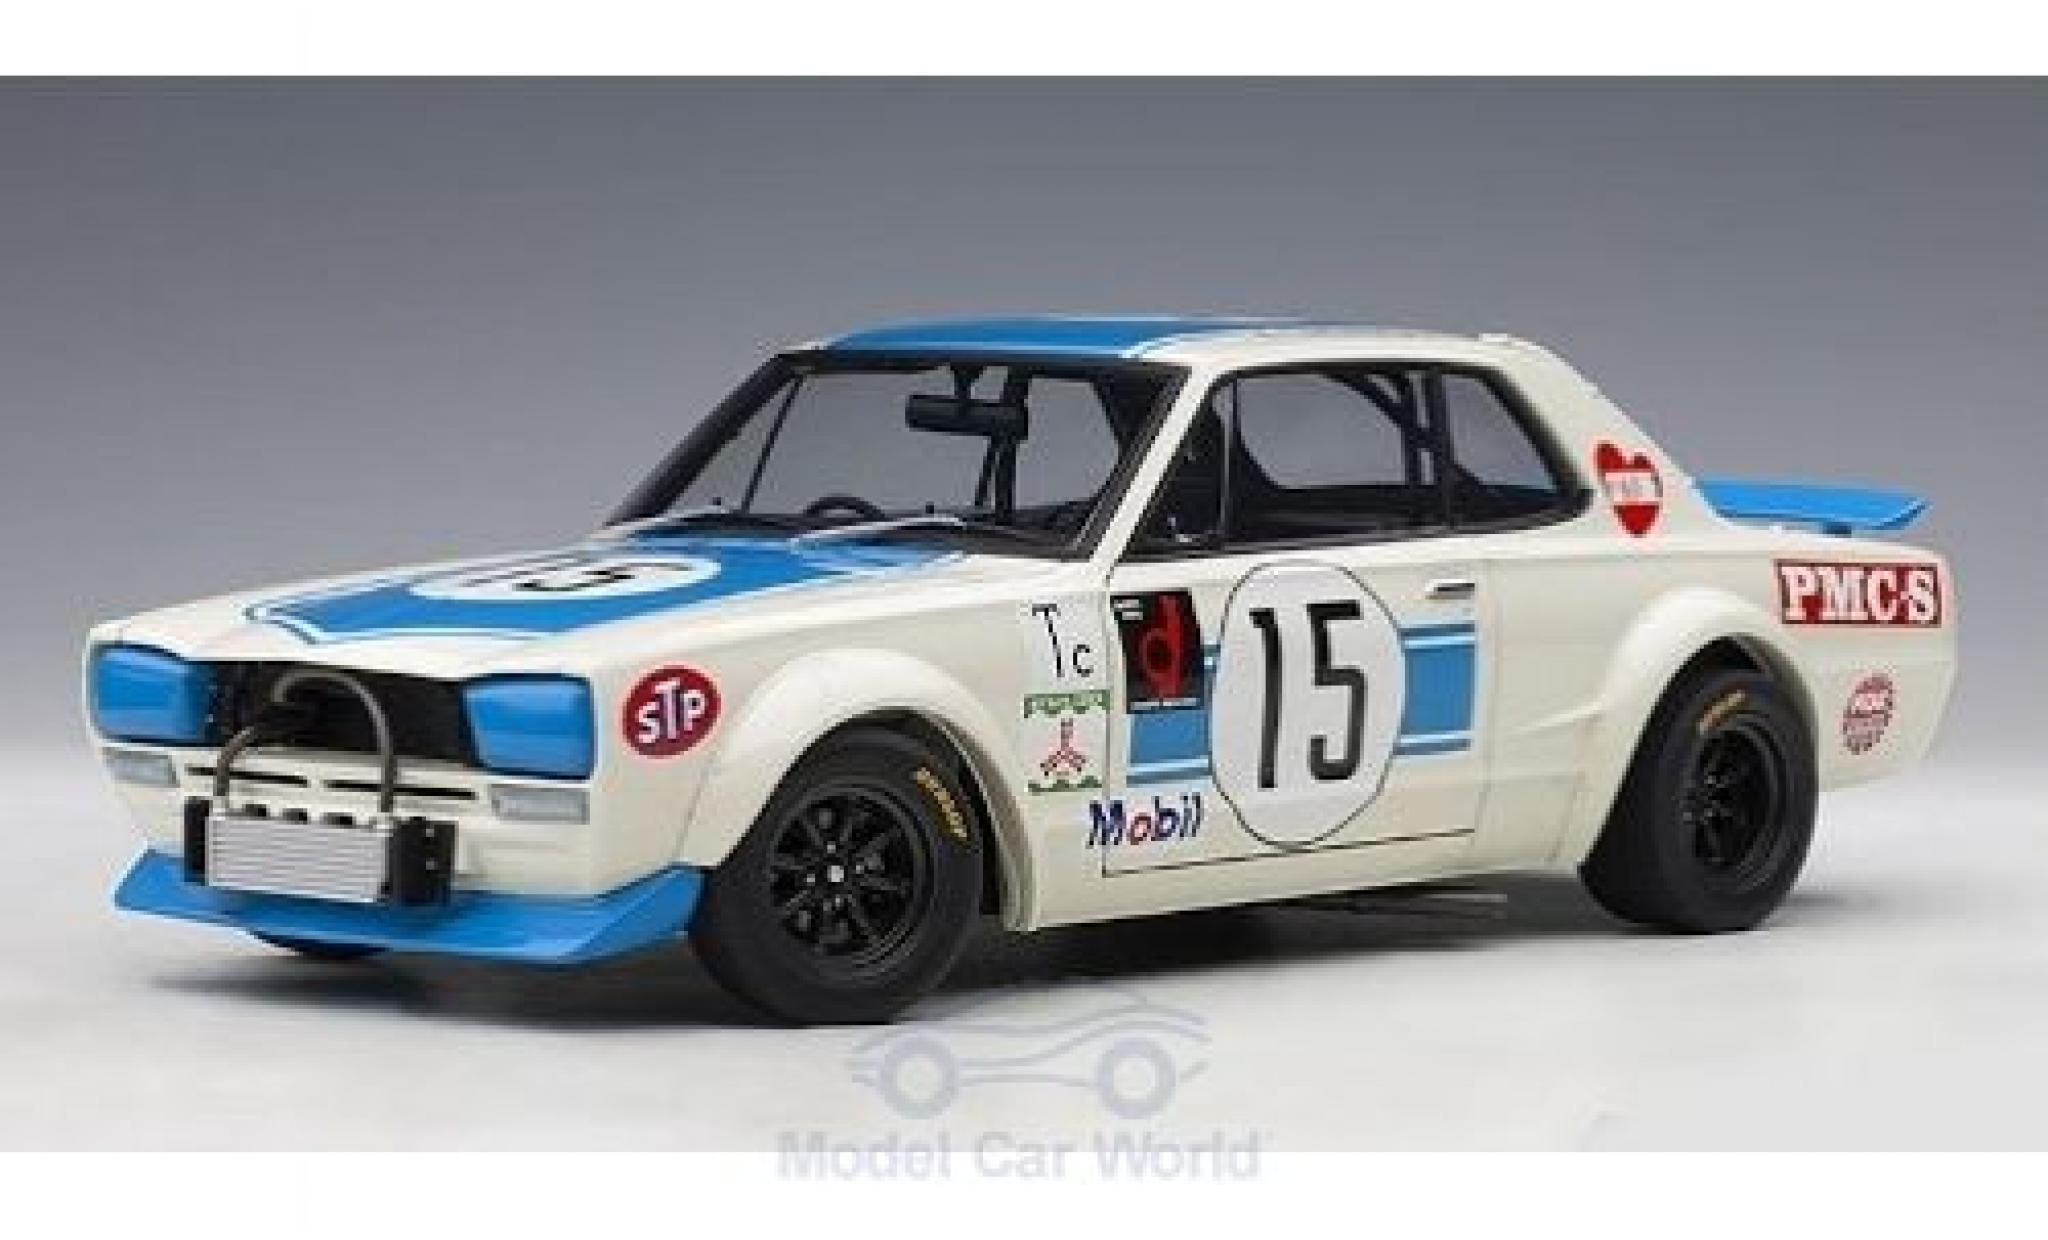 Nissan Skyline 1/18 AUTOart GT-R (KPGC-10) RHD No.15 300 KM Fuji Speed Race 1972 K.Takahashi